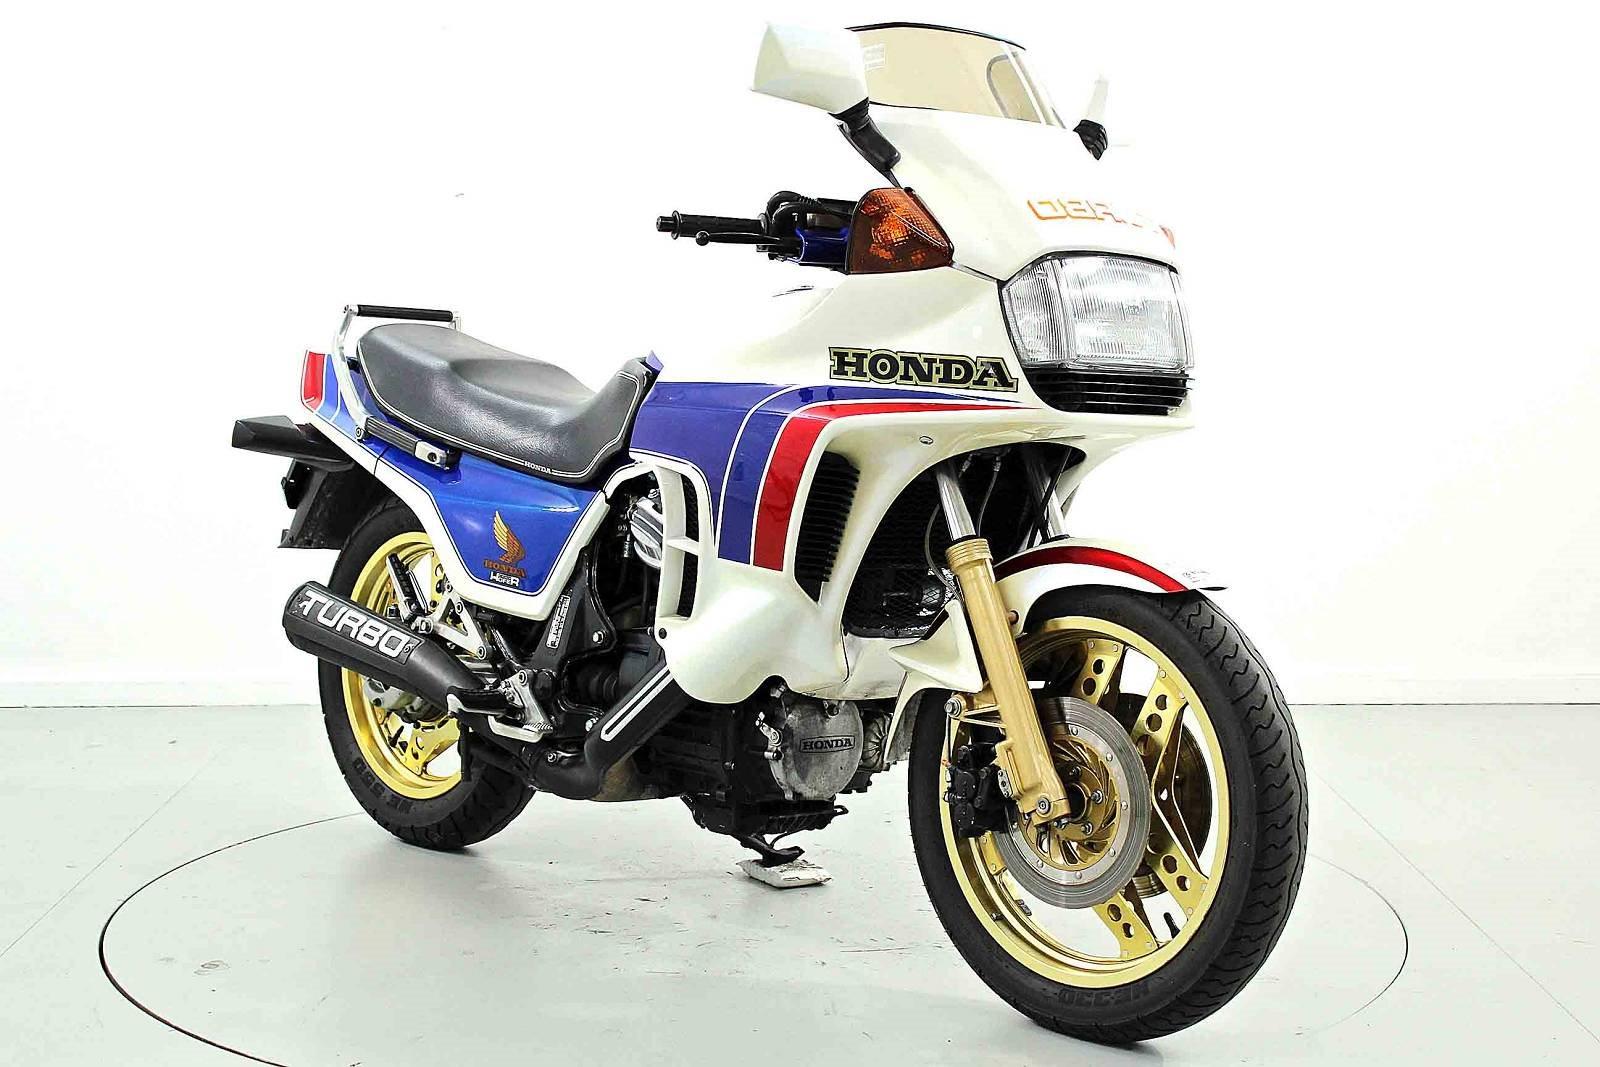 Motorrad Occasion Honda CX 500 Turbo, EZ: 1982, 58400 km